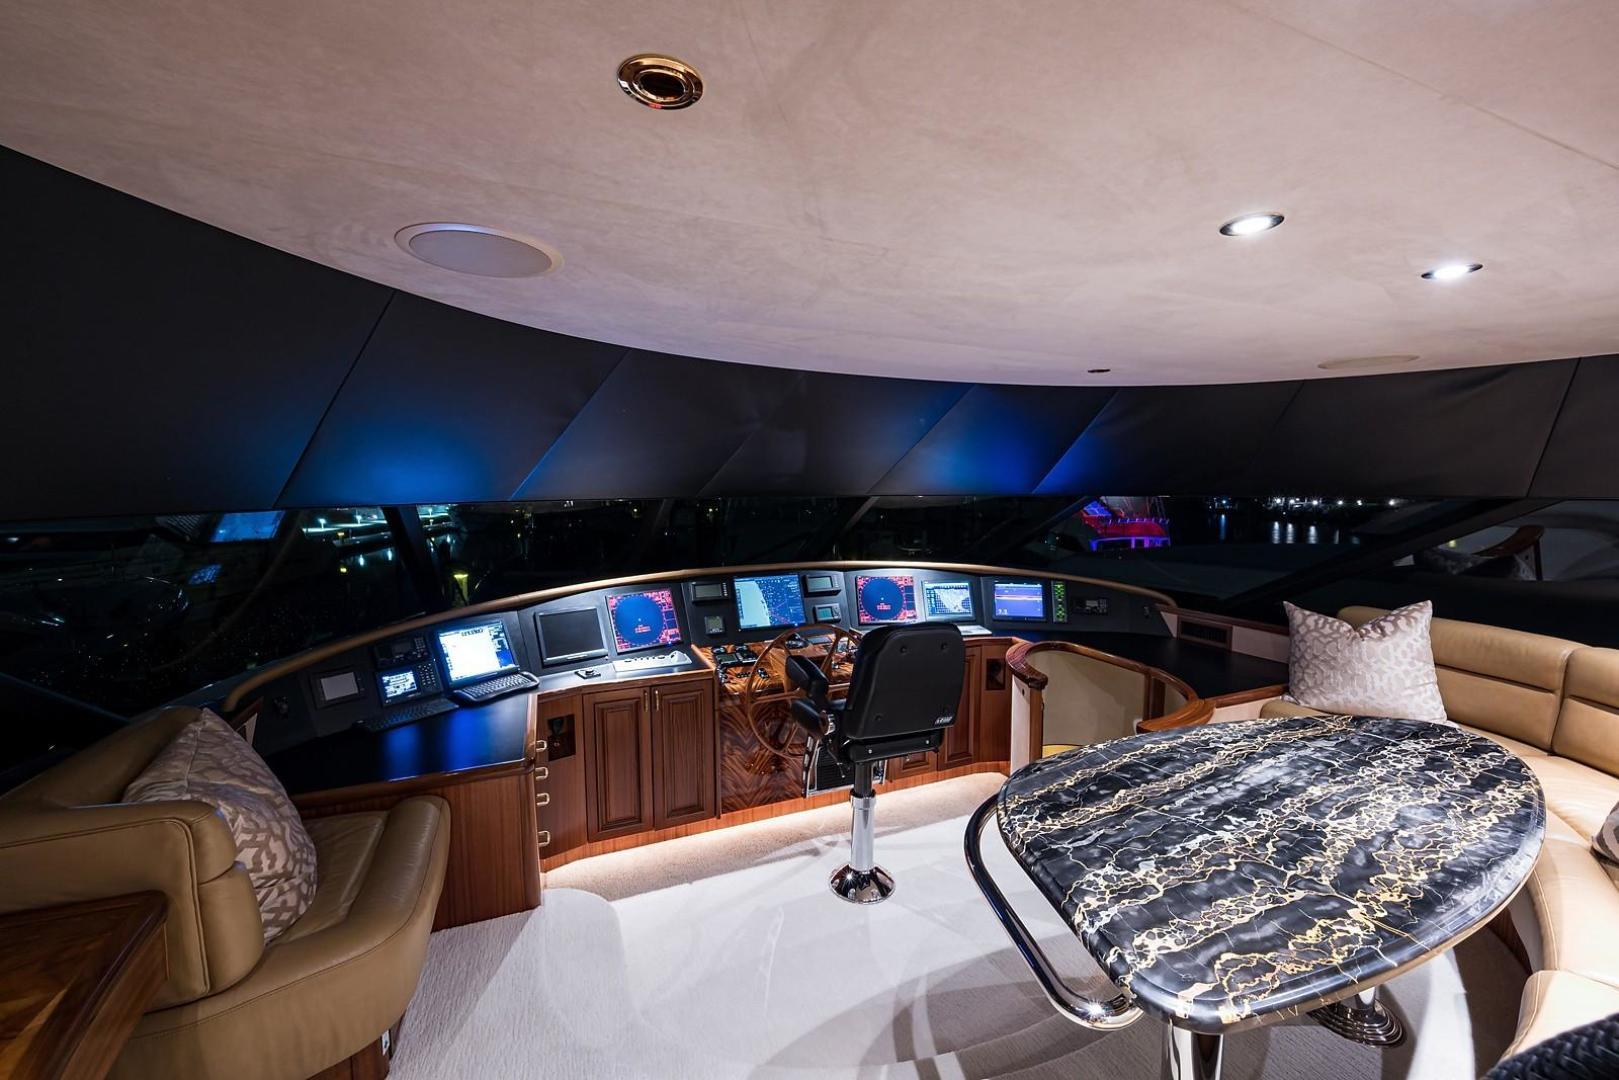 Westport-Motoryacht 2010-Cavallino Fort Lauderdale-Florida-United States-Pilothouse-1270132 | Thumbnail